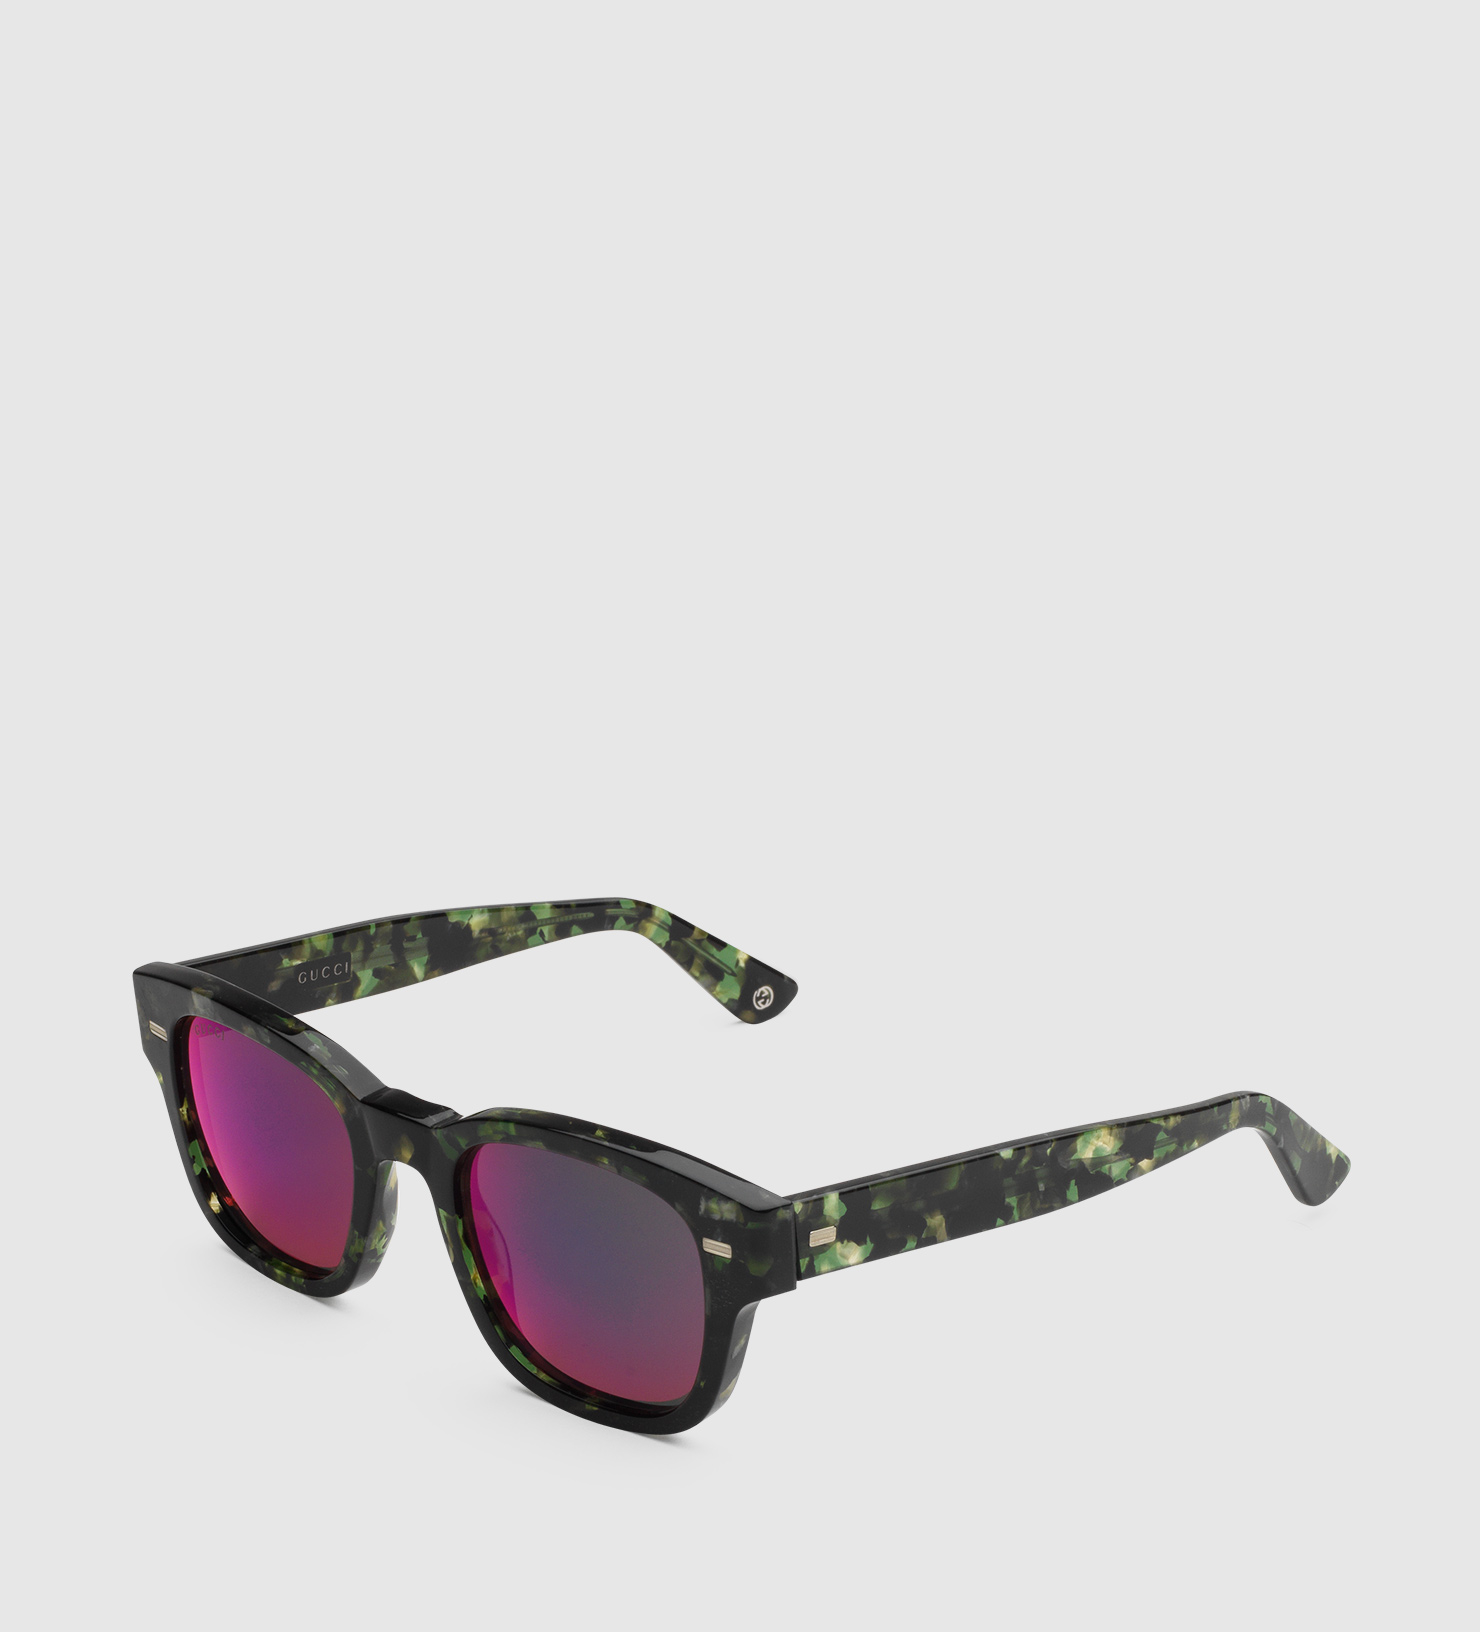 9ba747705b Gucci Havana Acetate Round-frame Sunglasses in Black for Men